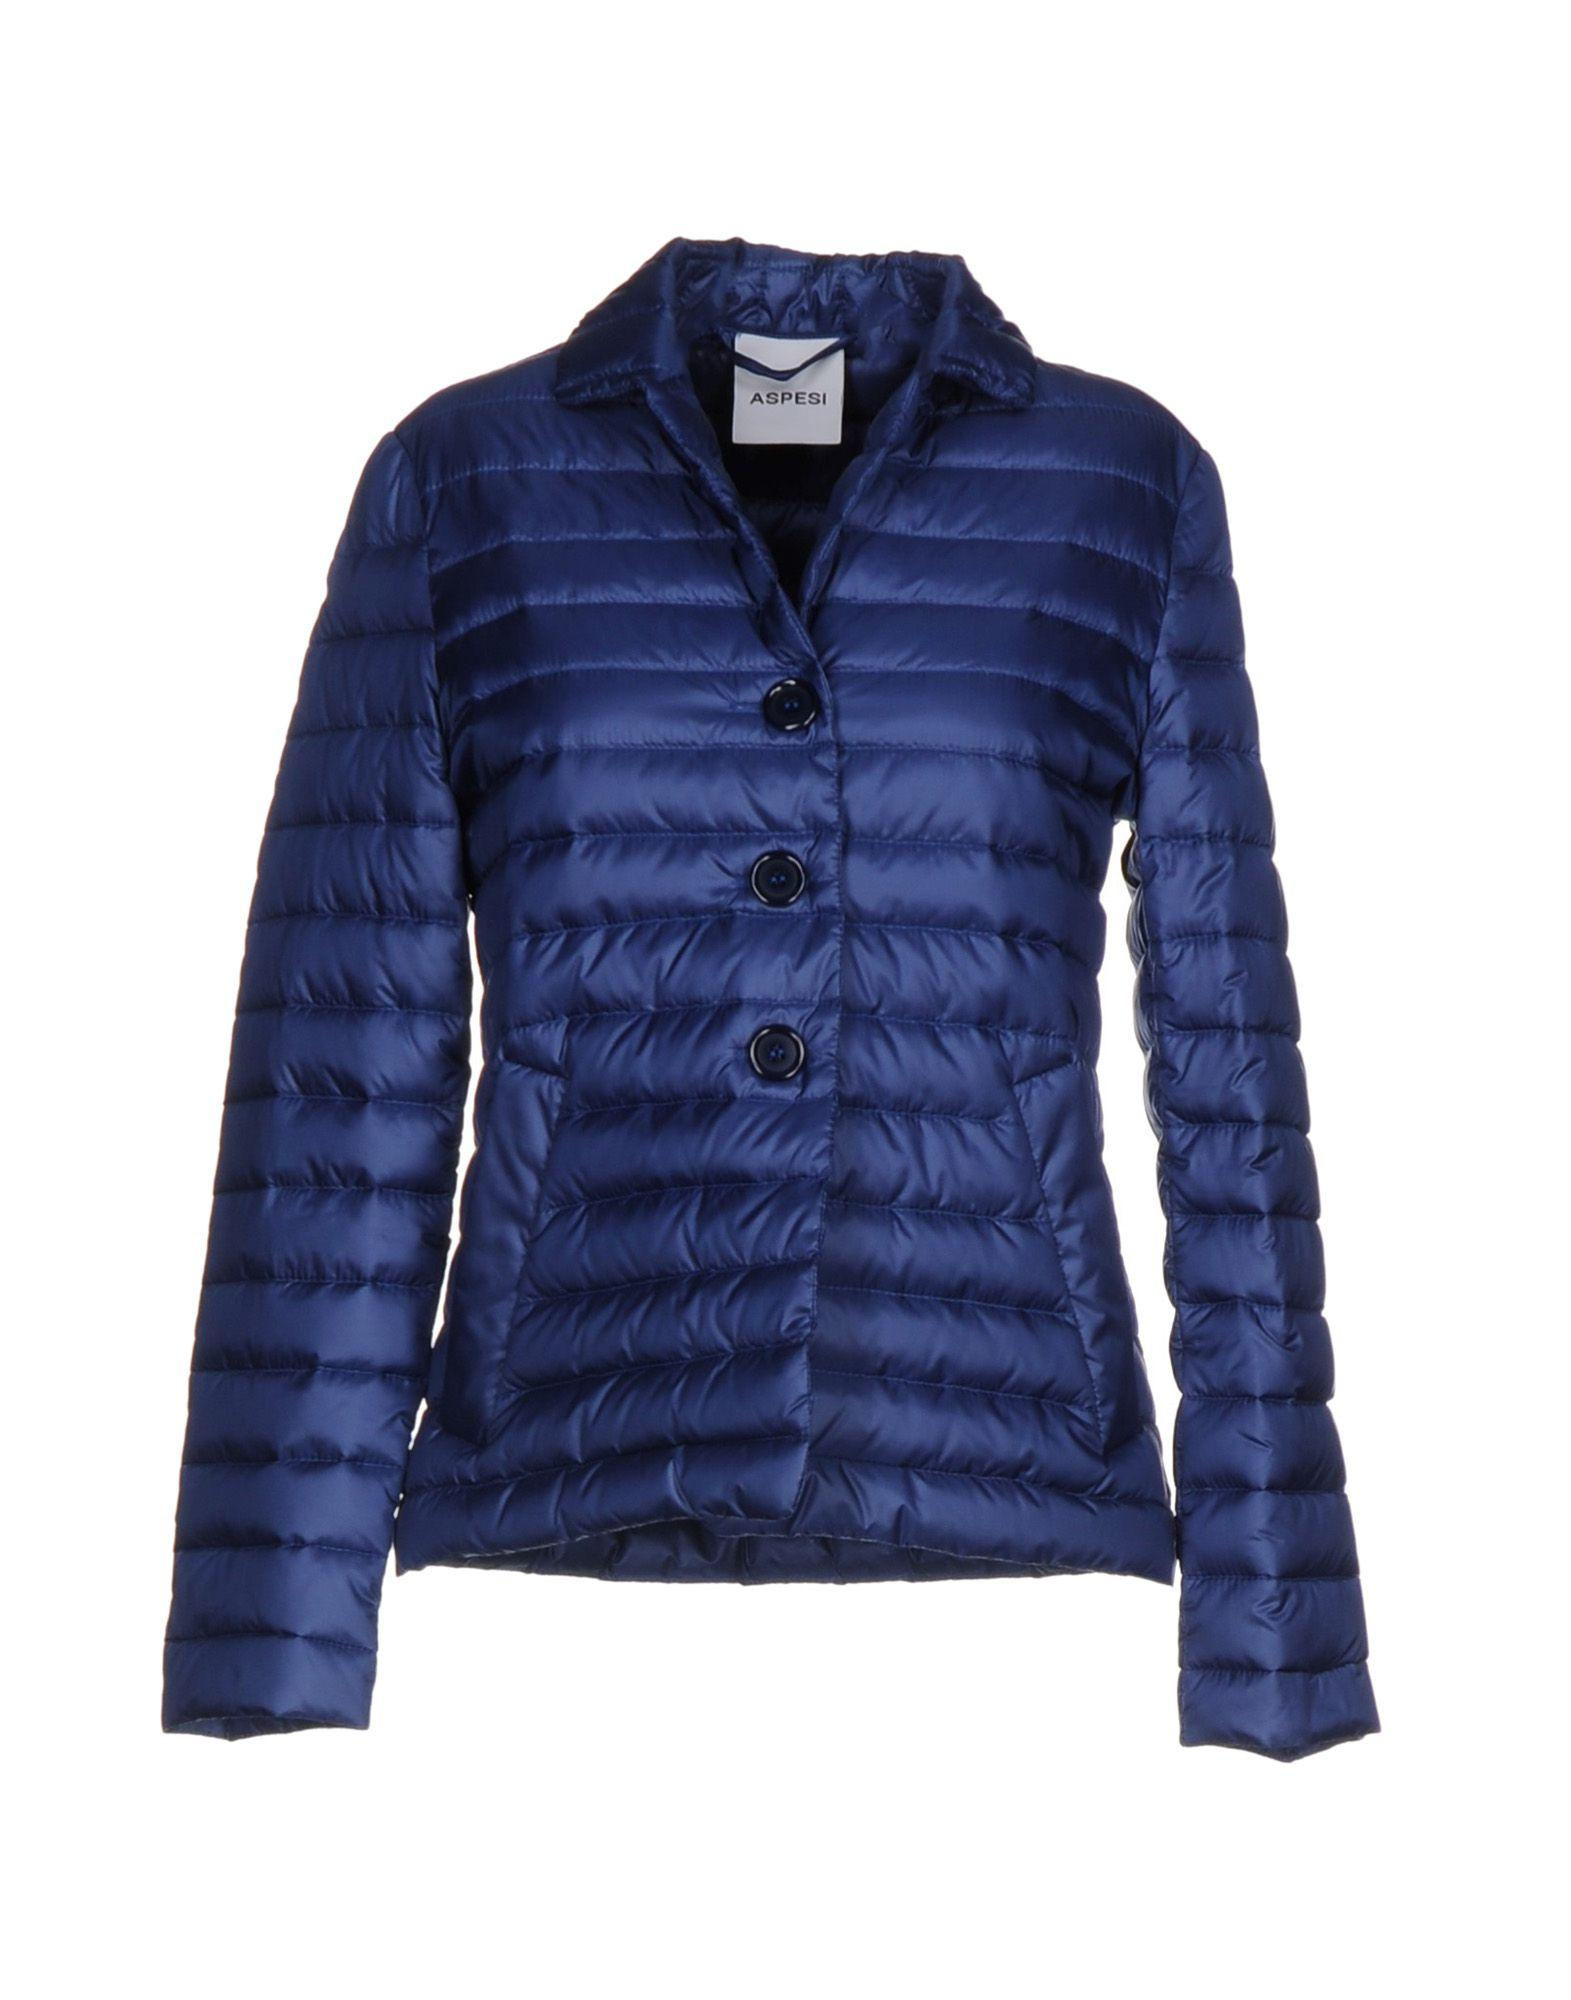 Aspesi Down Jacket In Blue